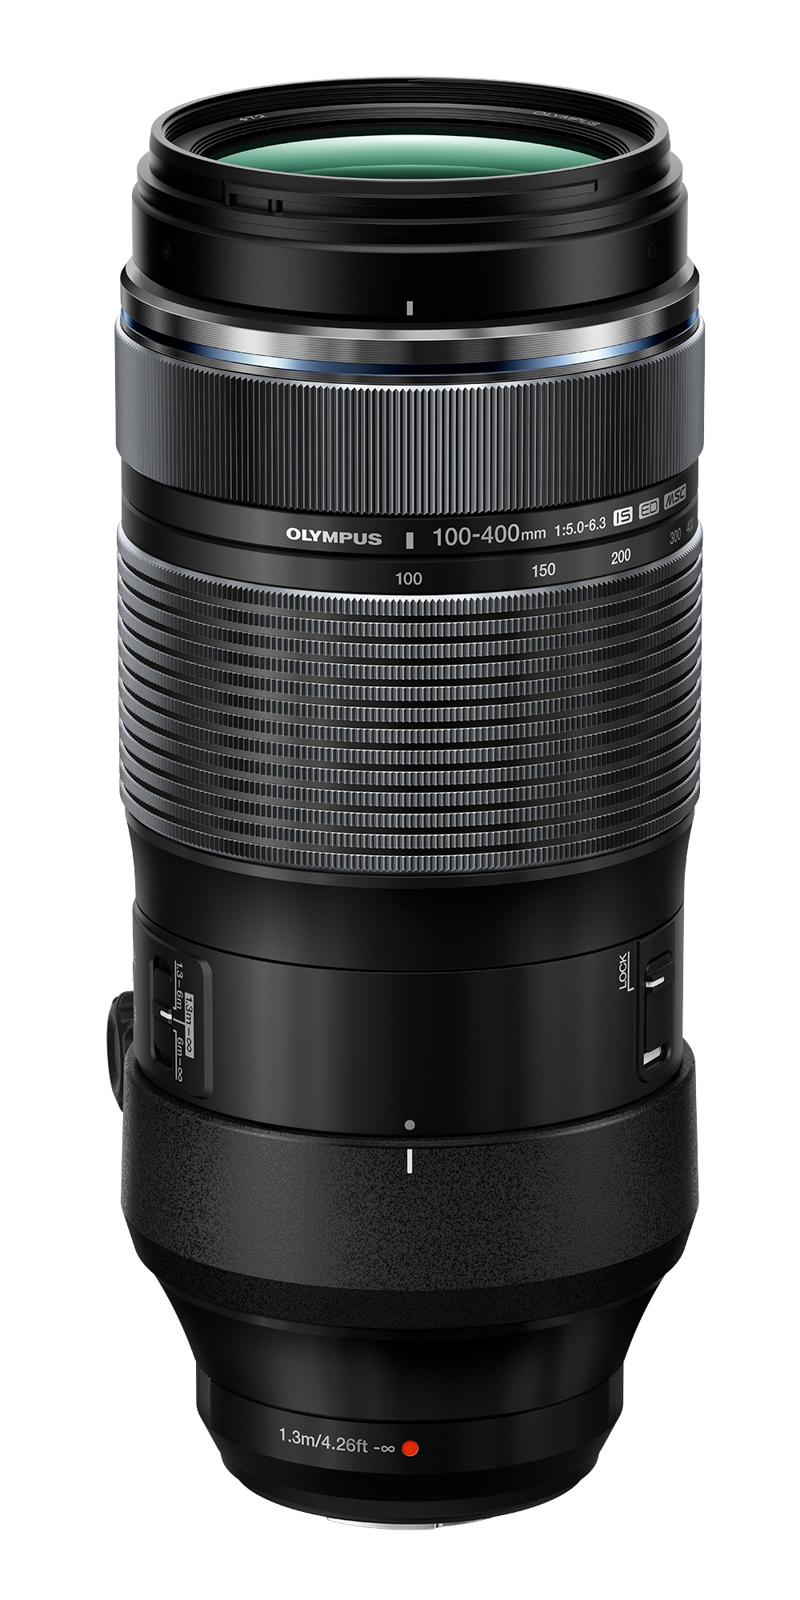 Olympus M.Zuiko ED 100-400mm F5-6.3